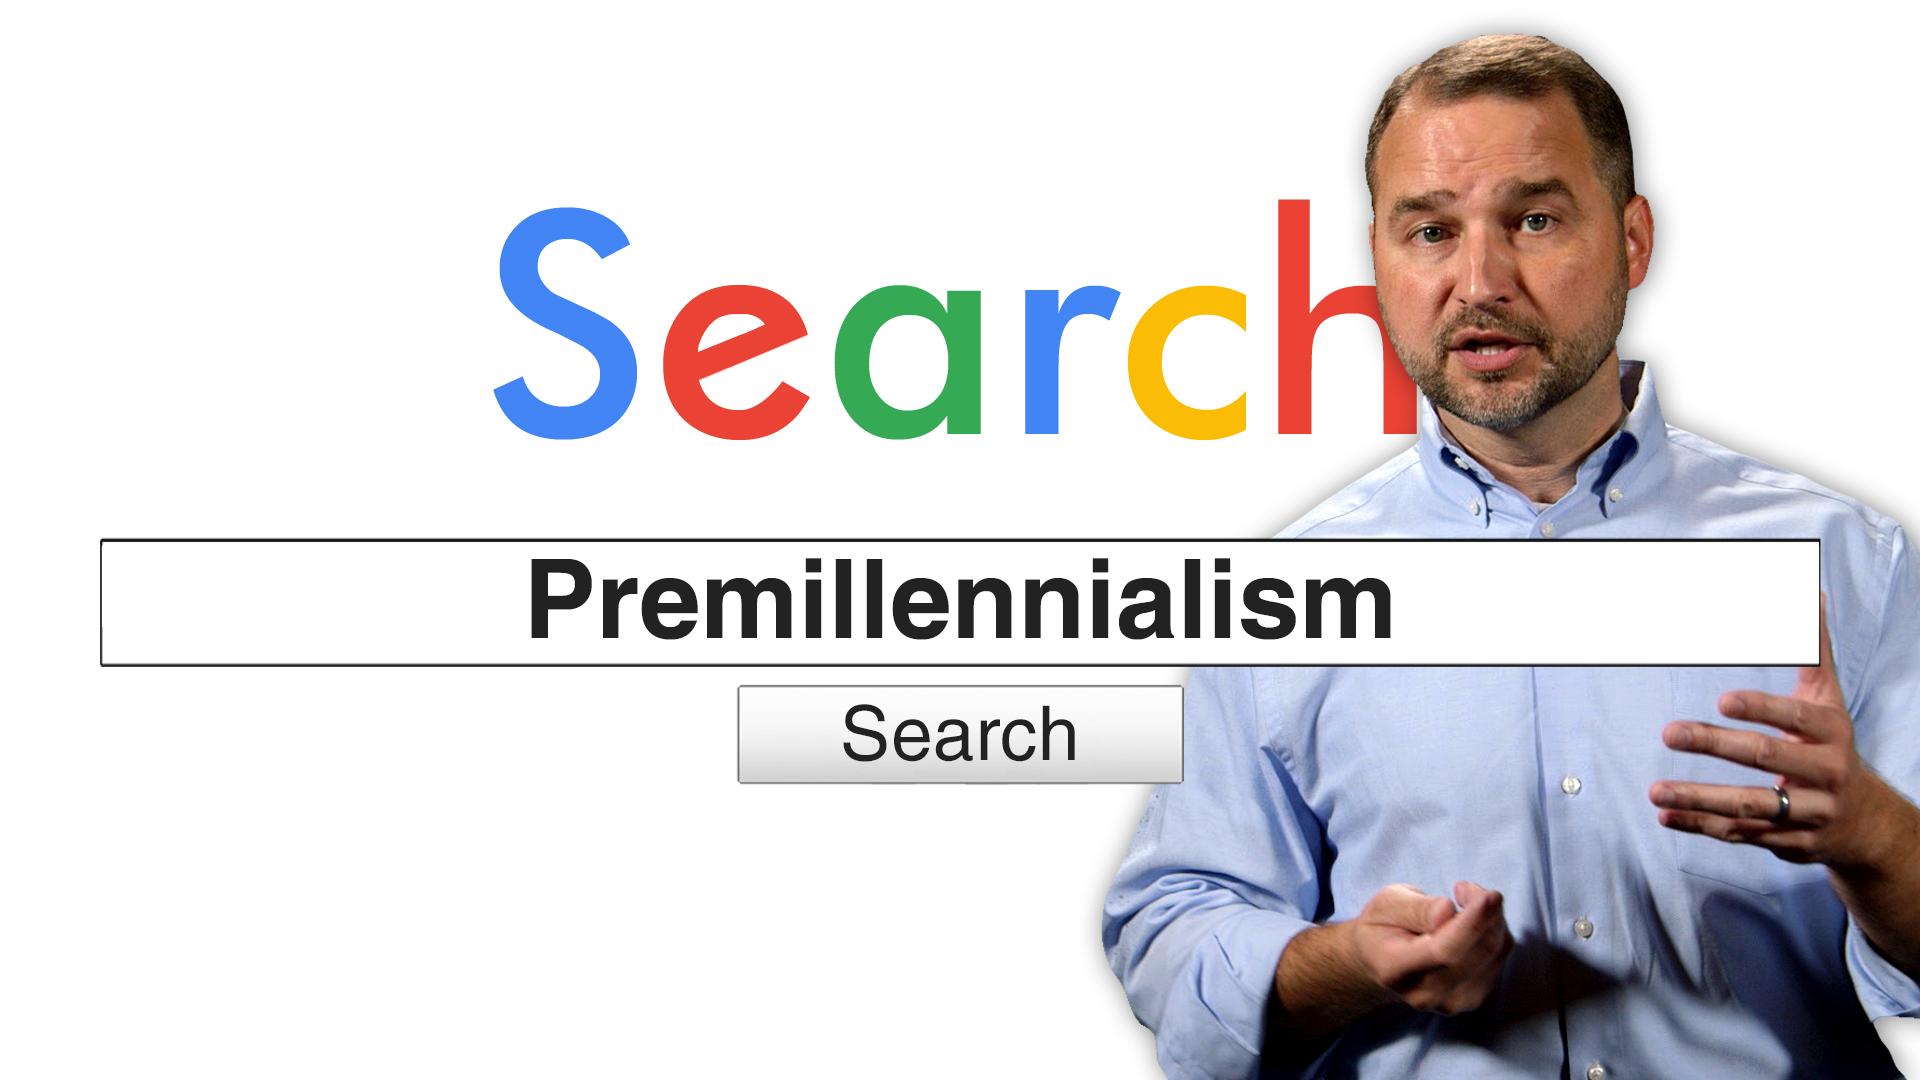 Search Premillennialism